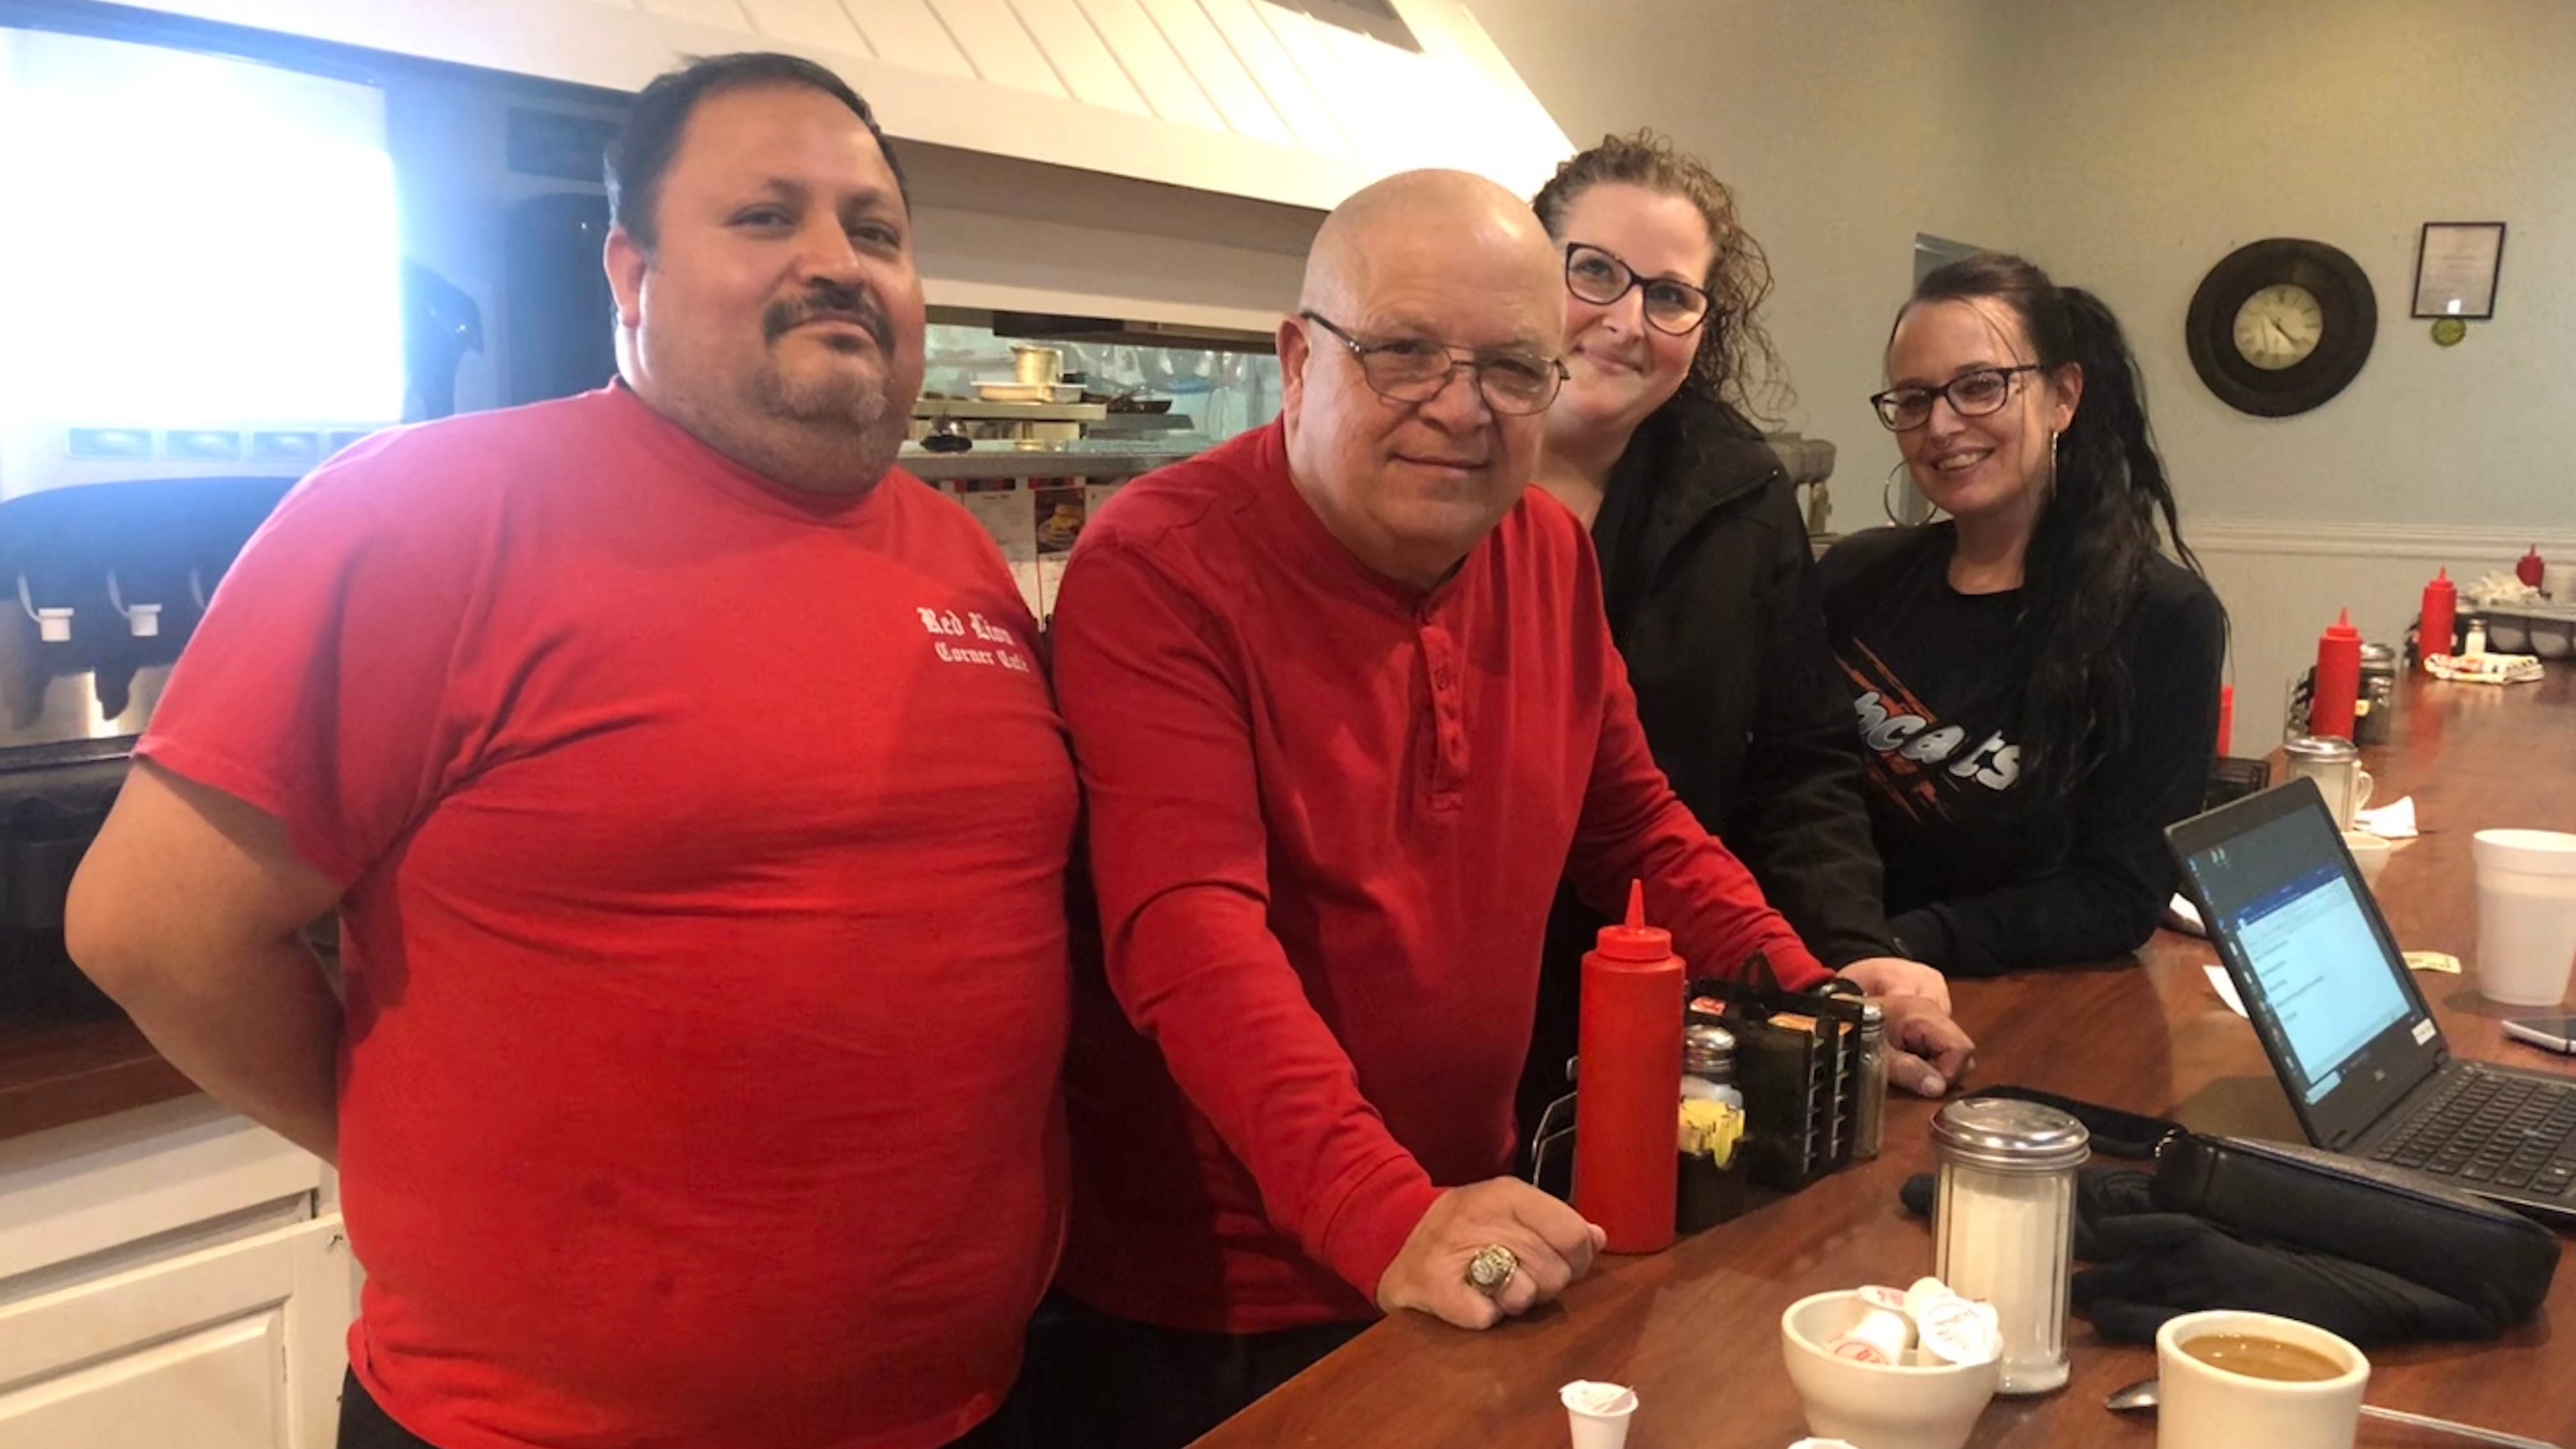 Red Lion waitresses deciding who deserves a gift